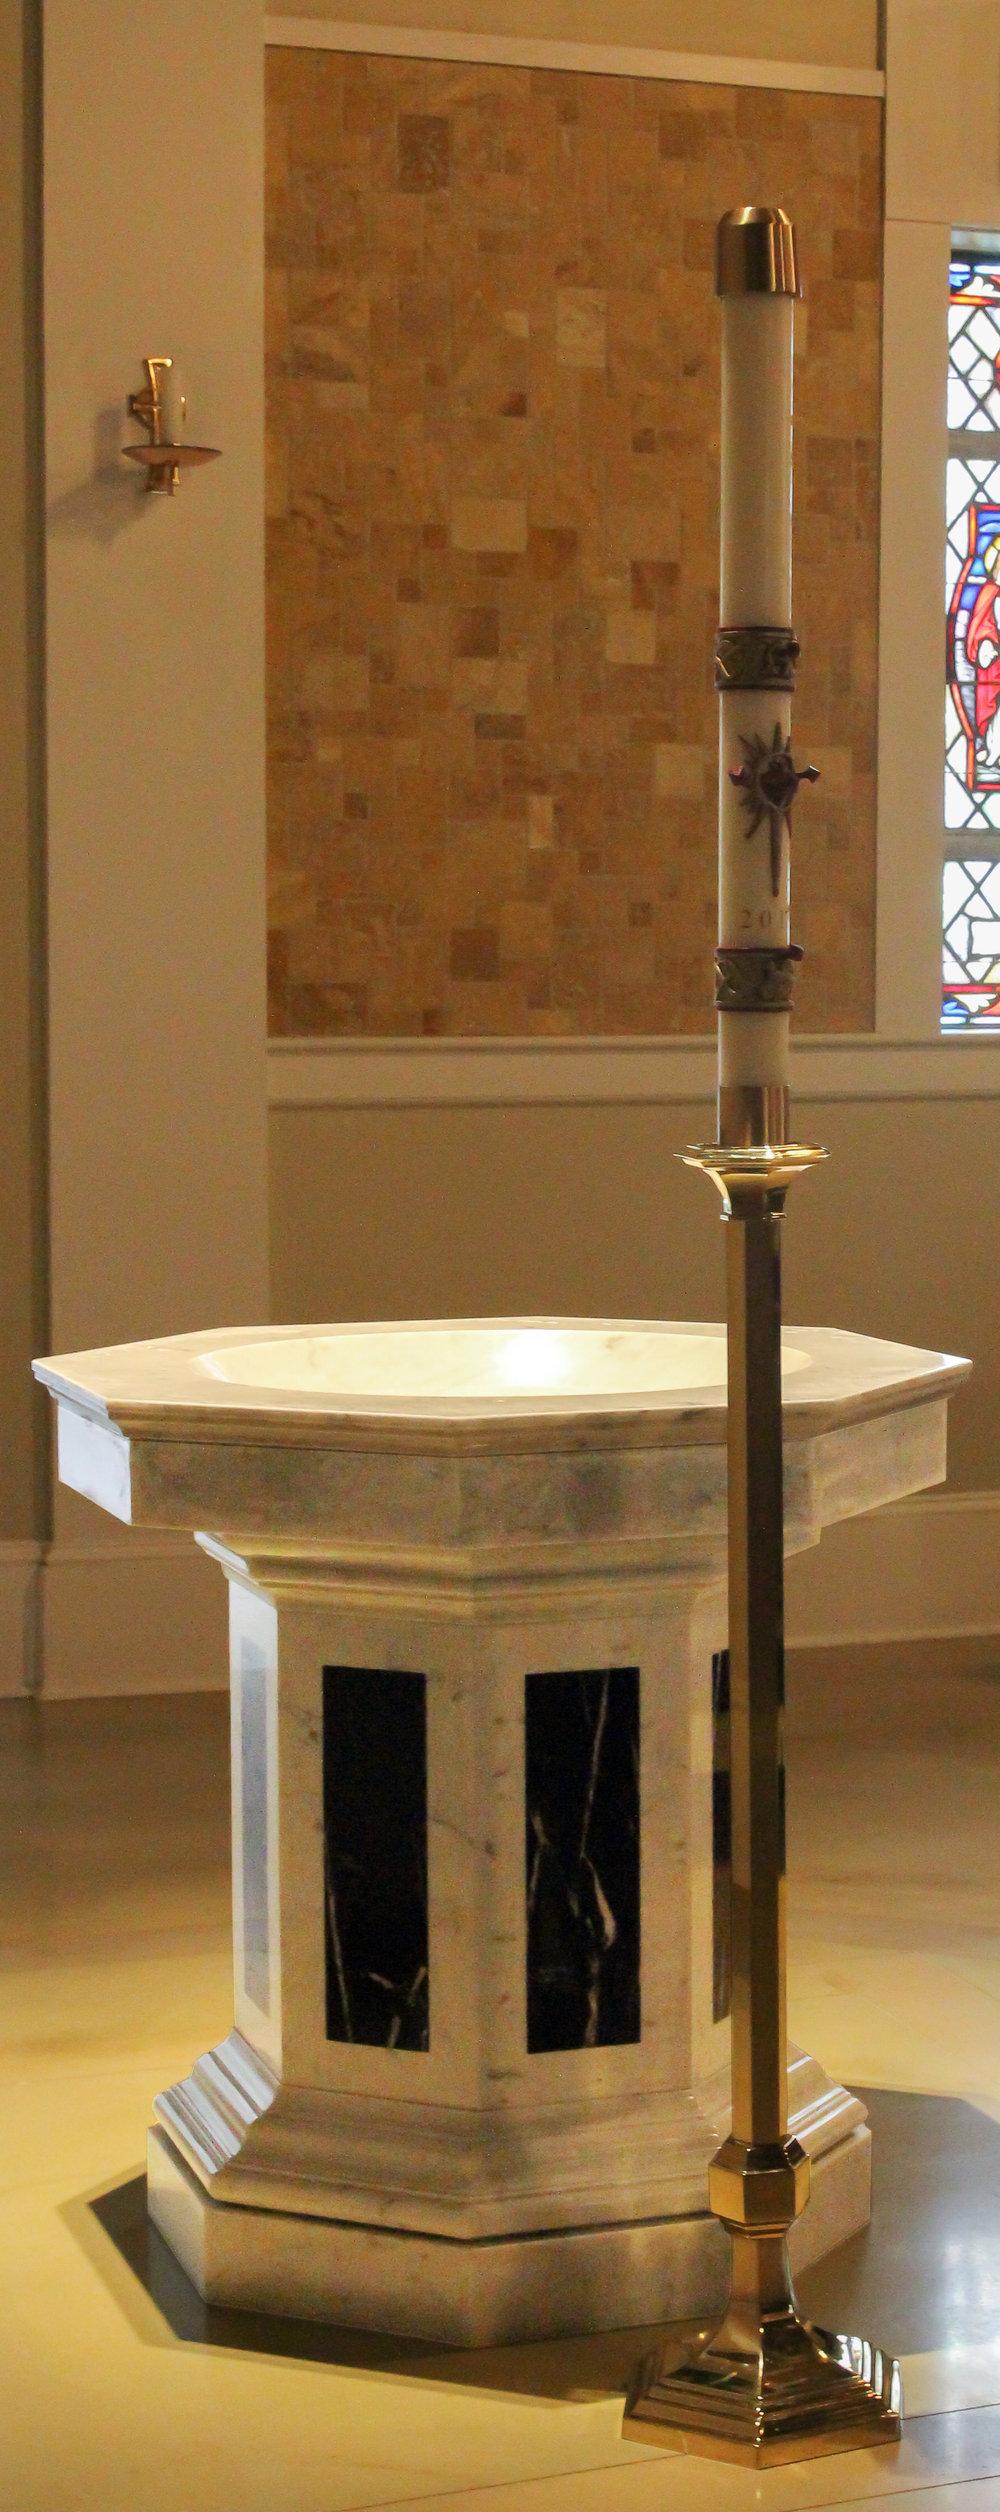 092217 Baptismal Font.jpg